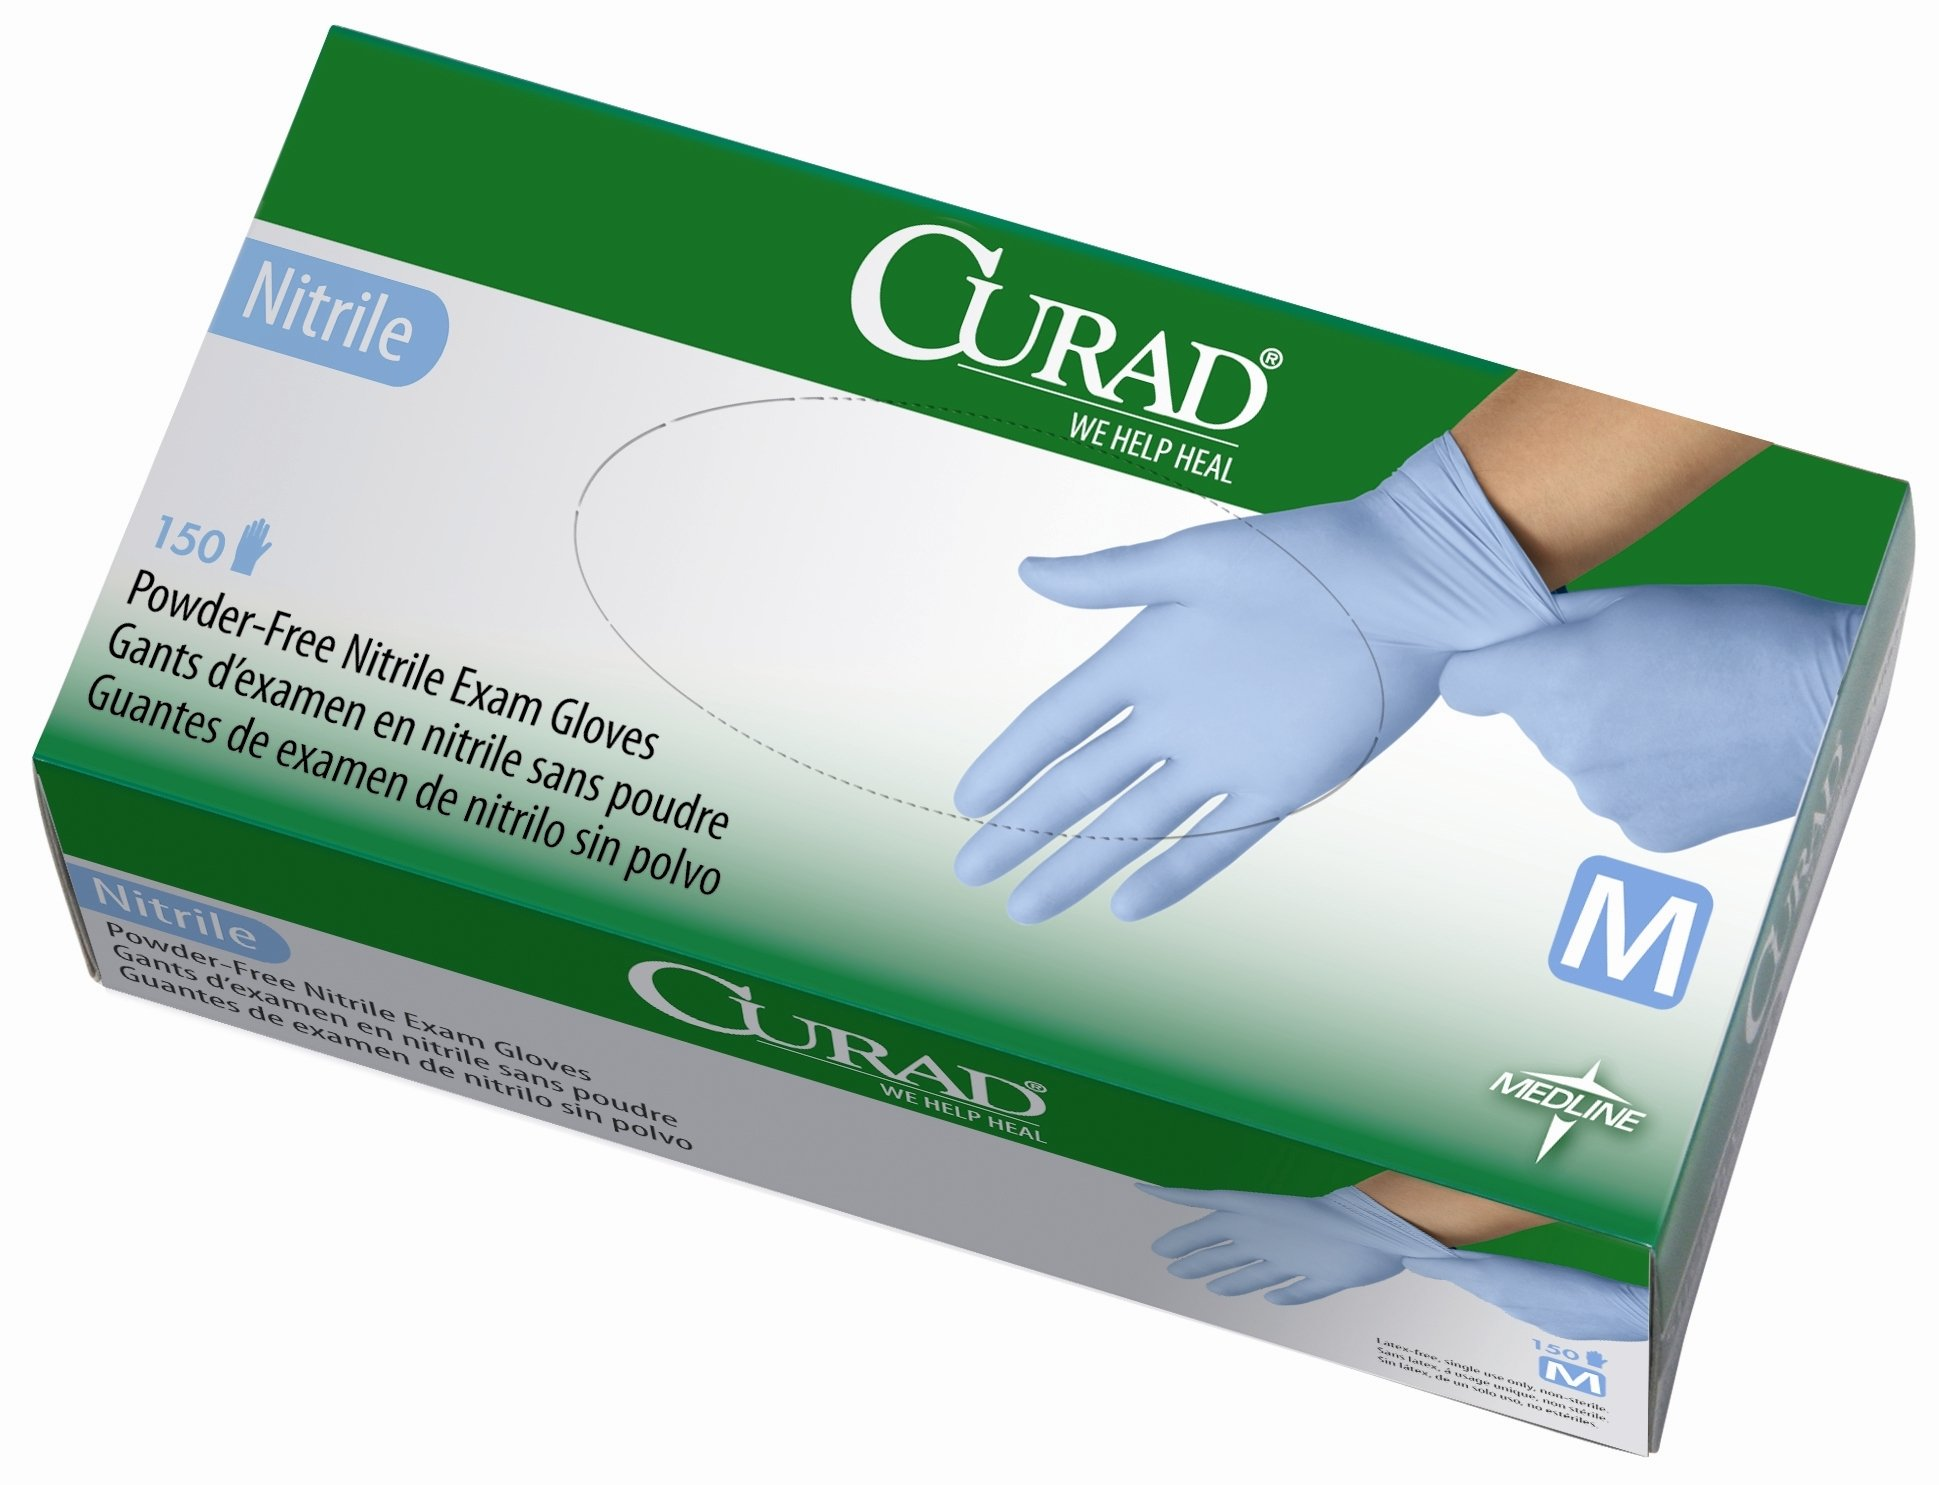 Curad Powder-Free Nitrile, Medium, 150 Count